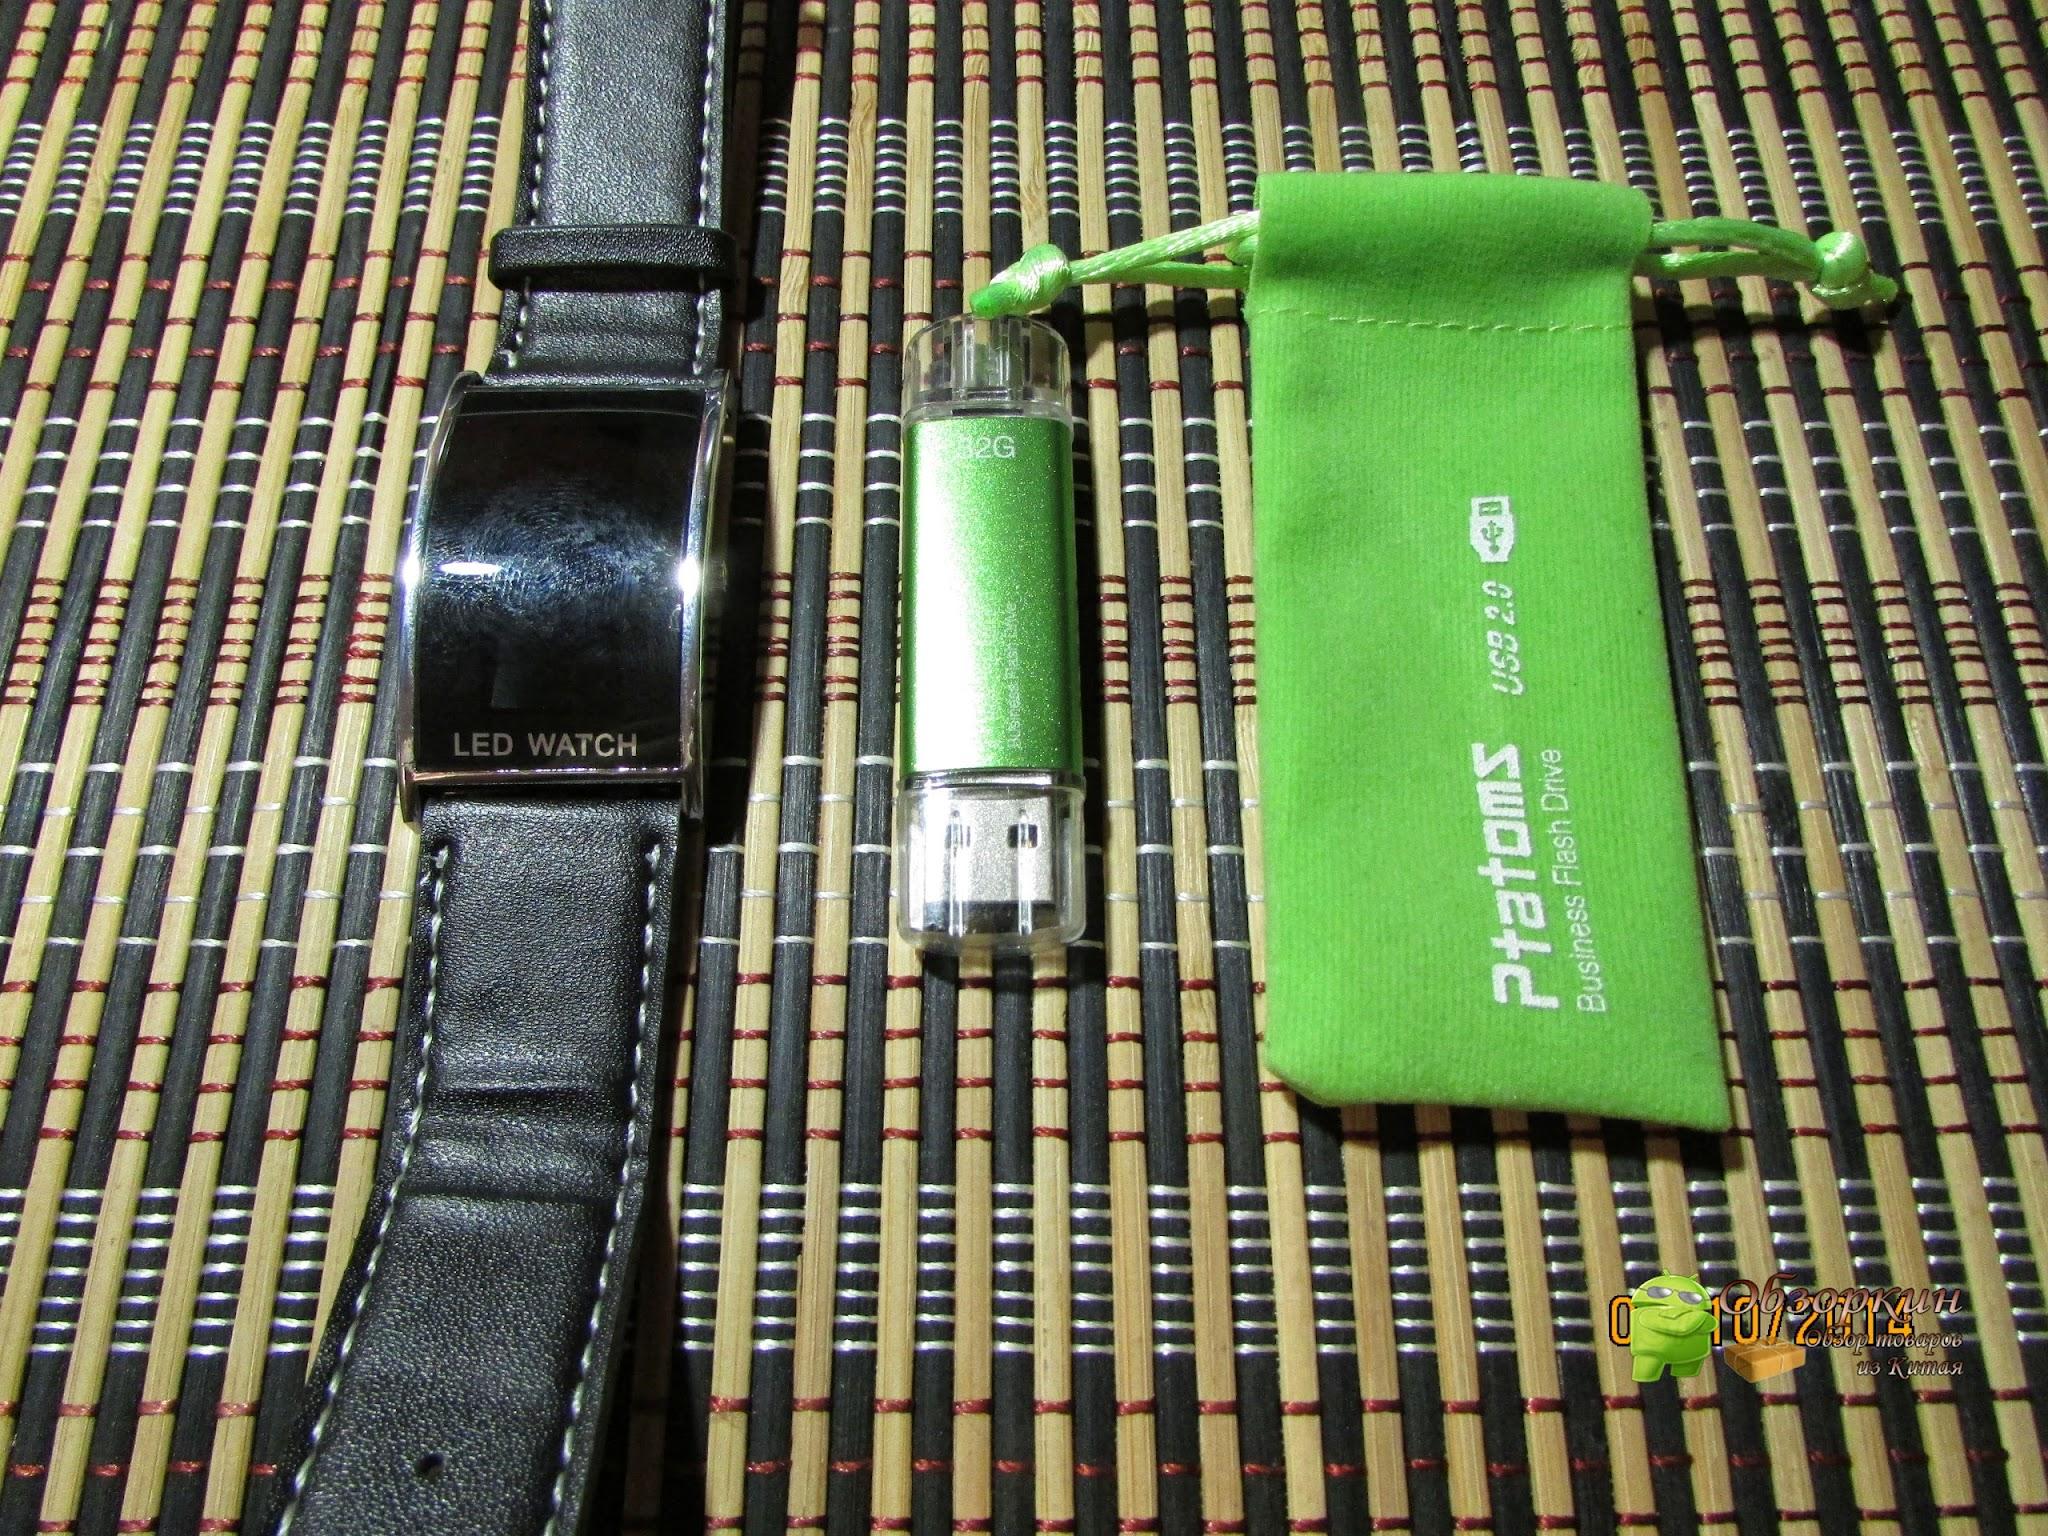 Флэшка Ptatoms с OTG, LED часы. Посылка из Китая. Aliexpress